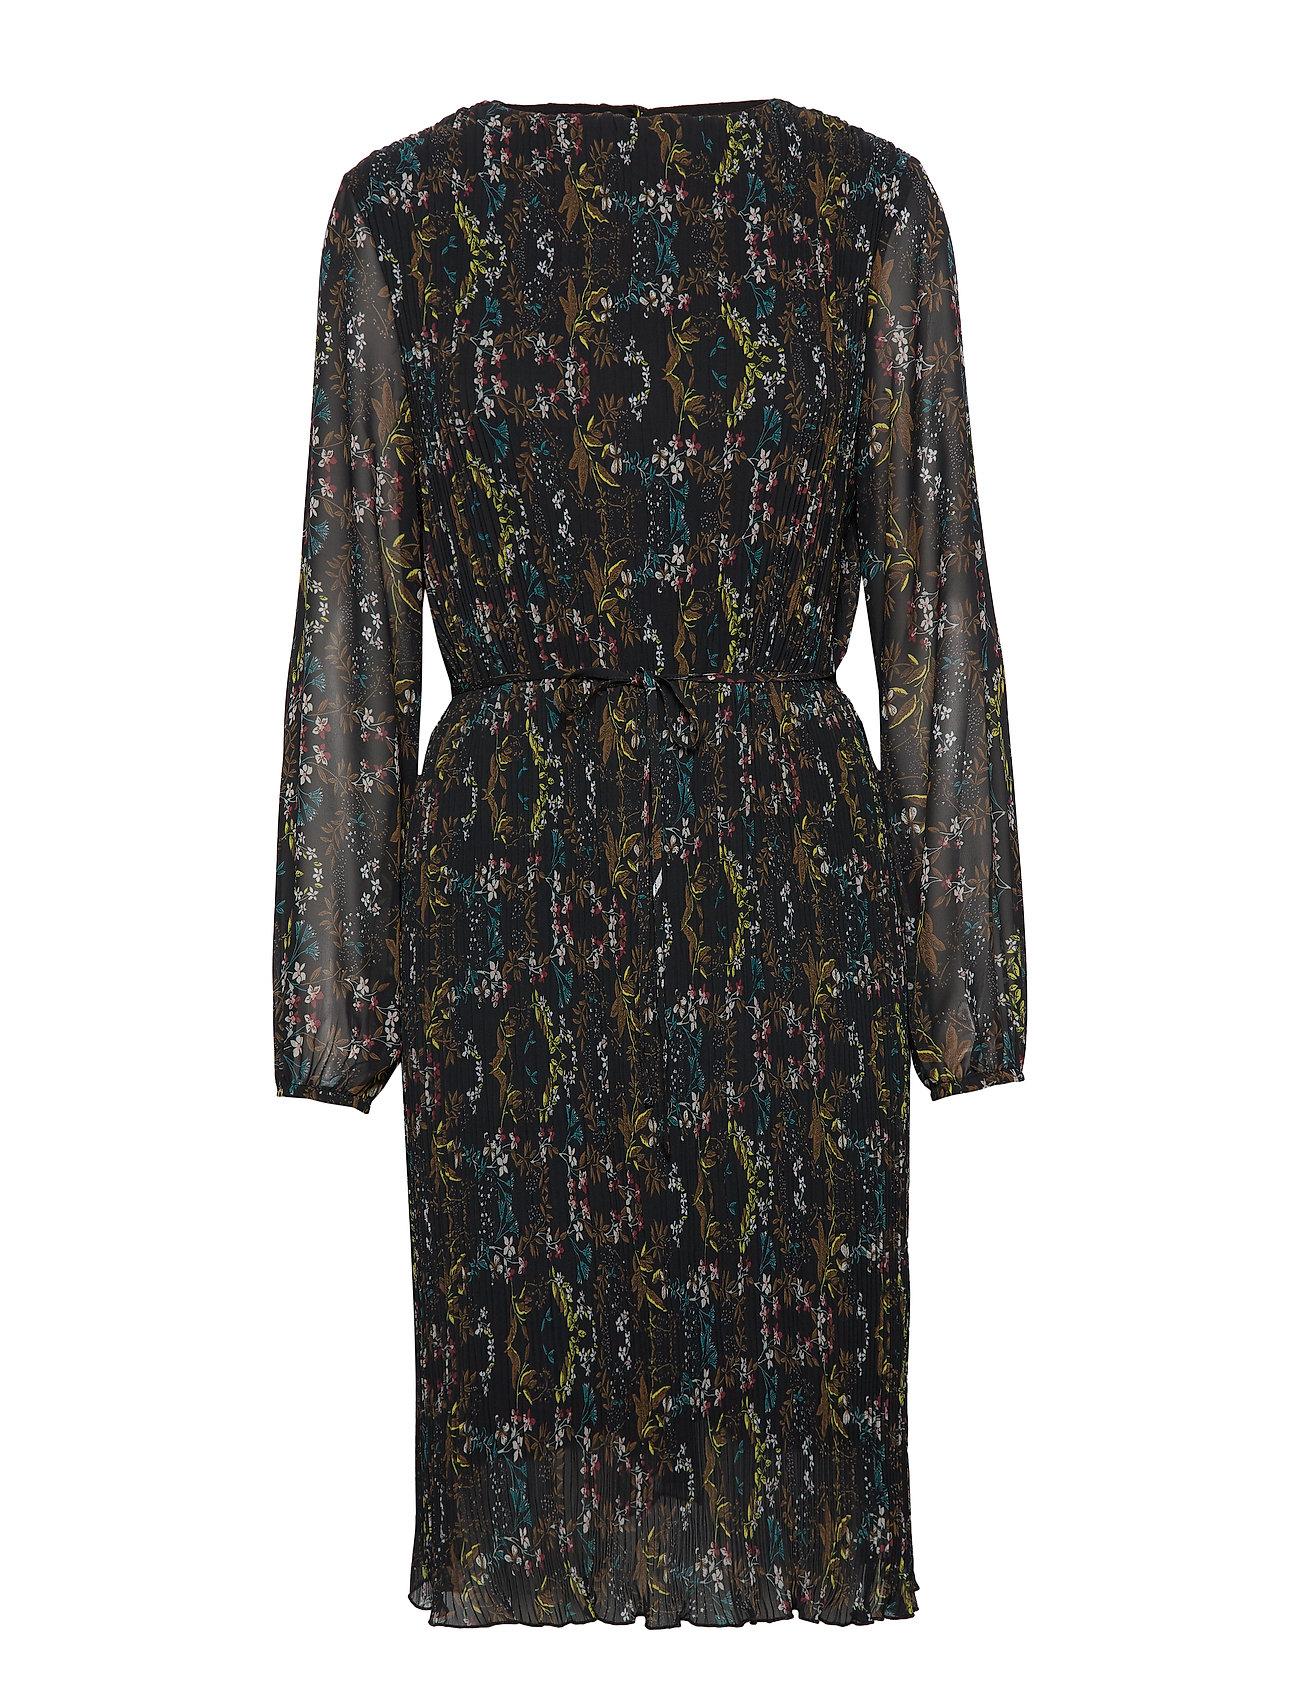 Minus Cynthia dress - PLEATED FLOWER PRINT